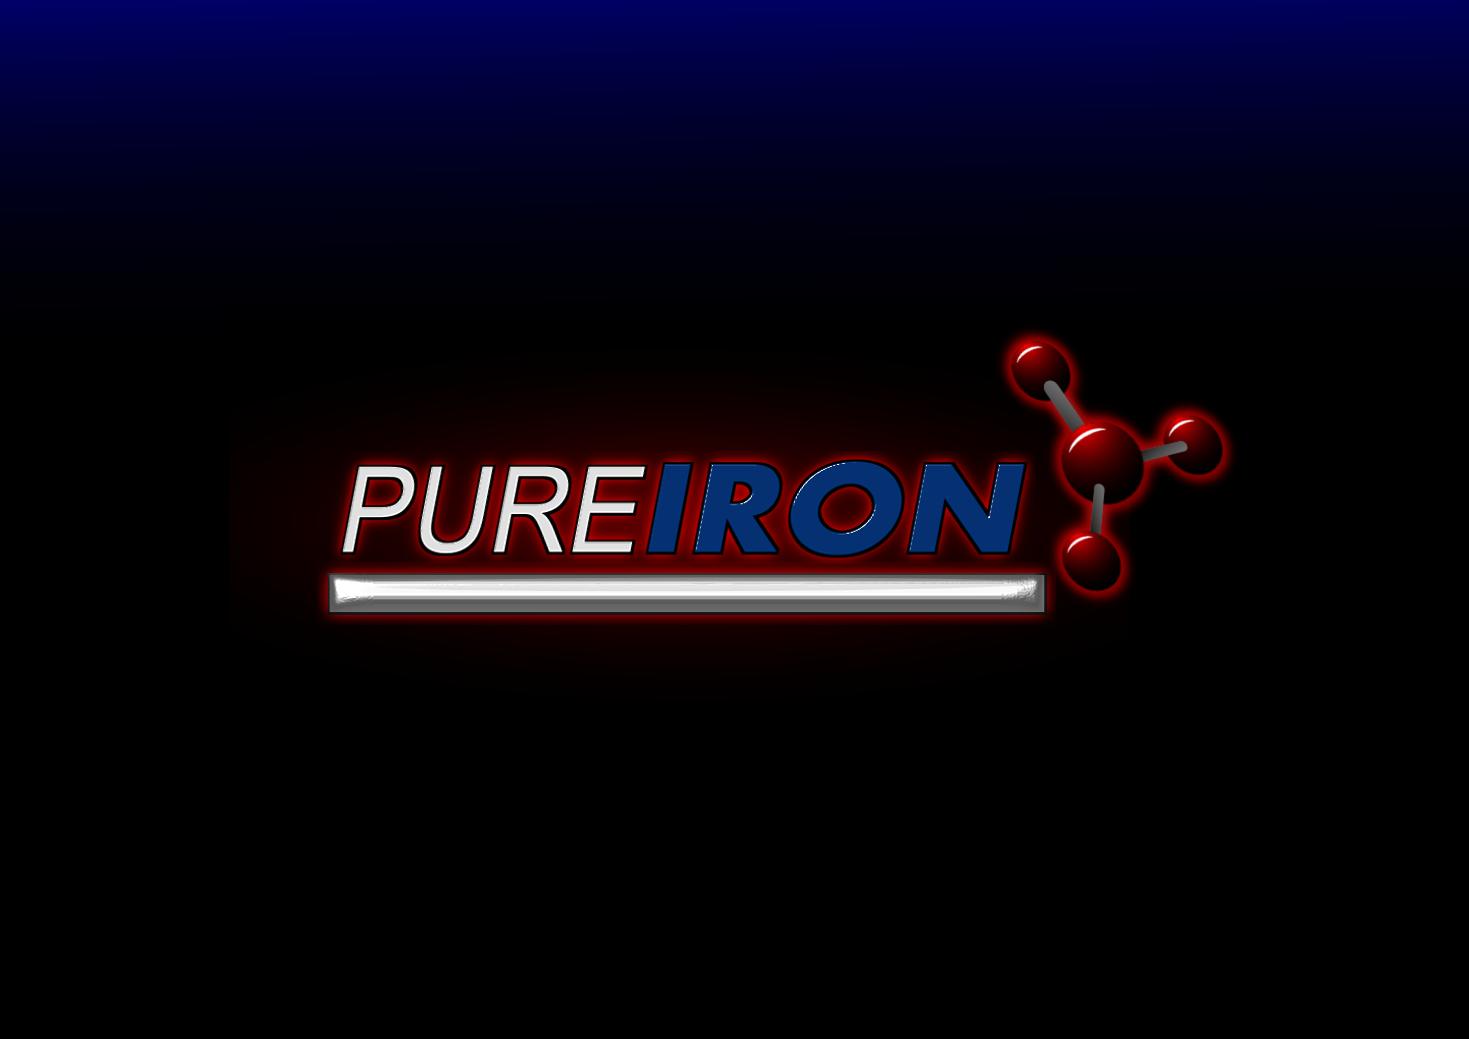 Logo Design by whoosef - Entry No. 162 in the Logo Design Contest Fun Logo Design for Pure Iron.